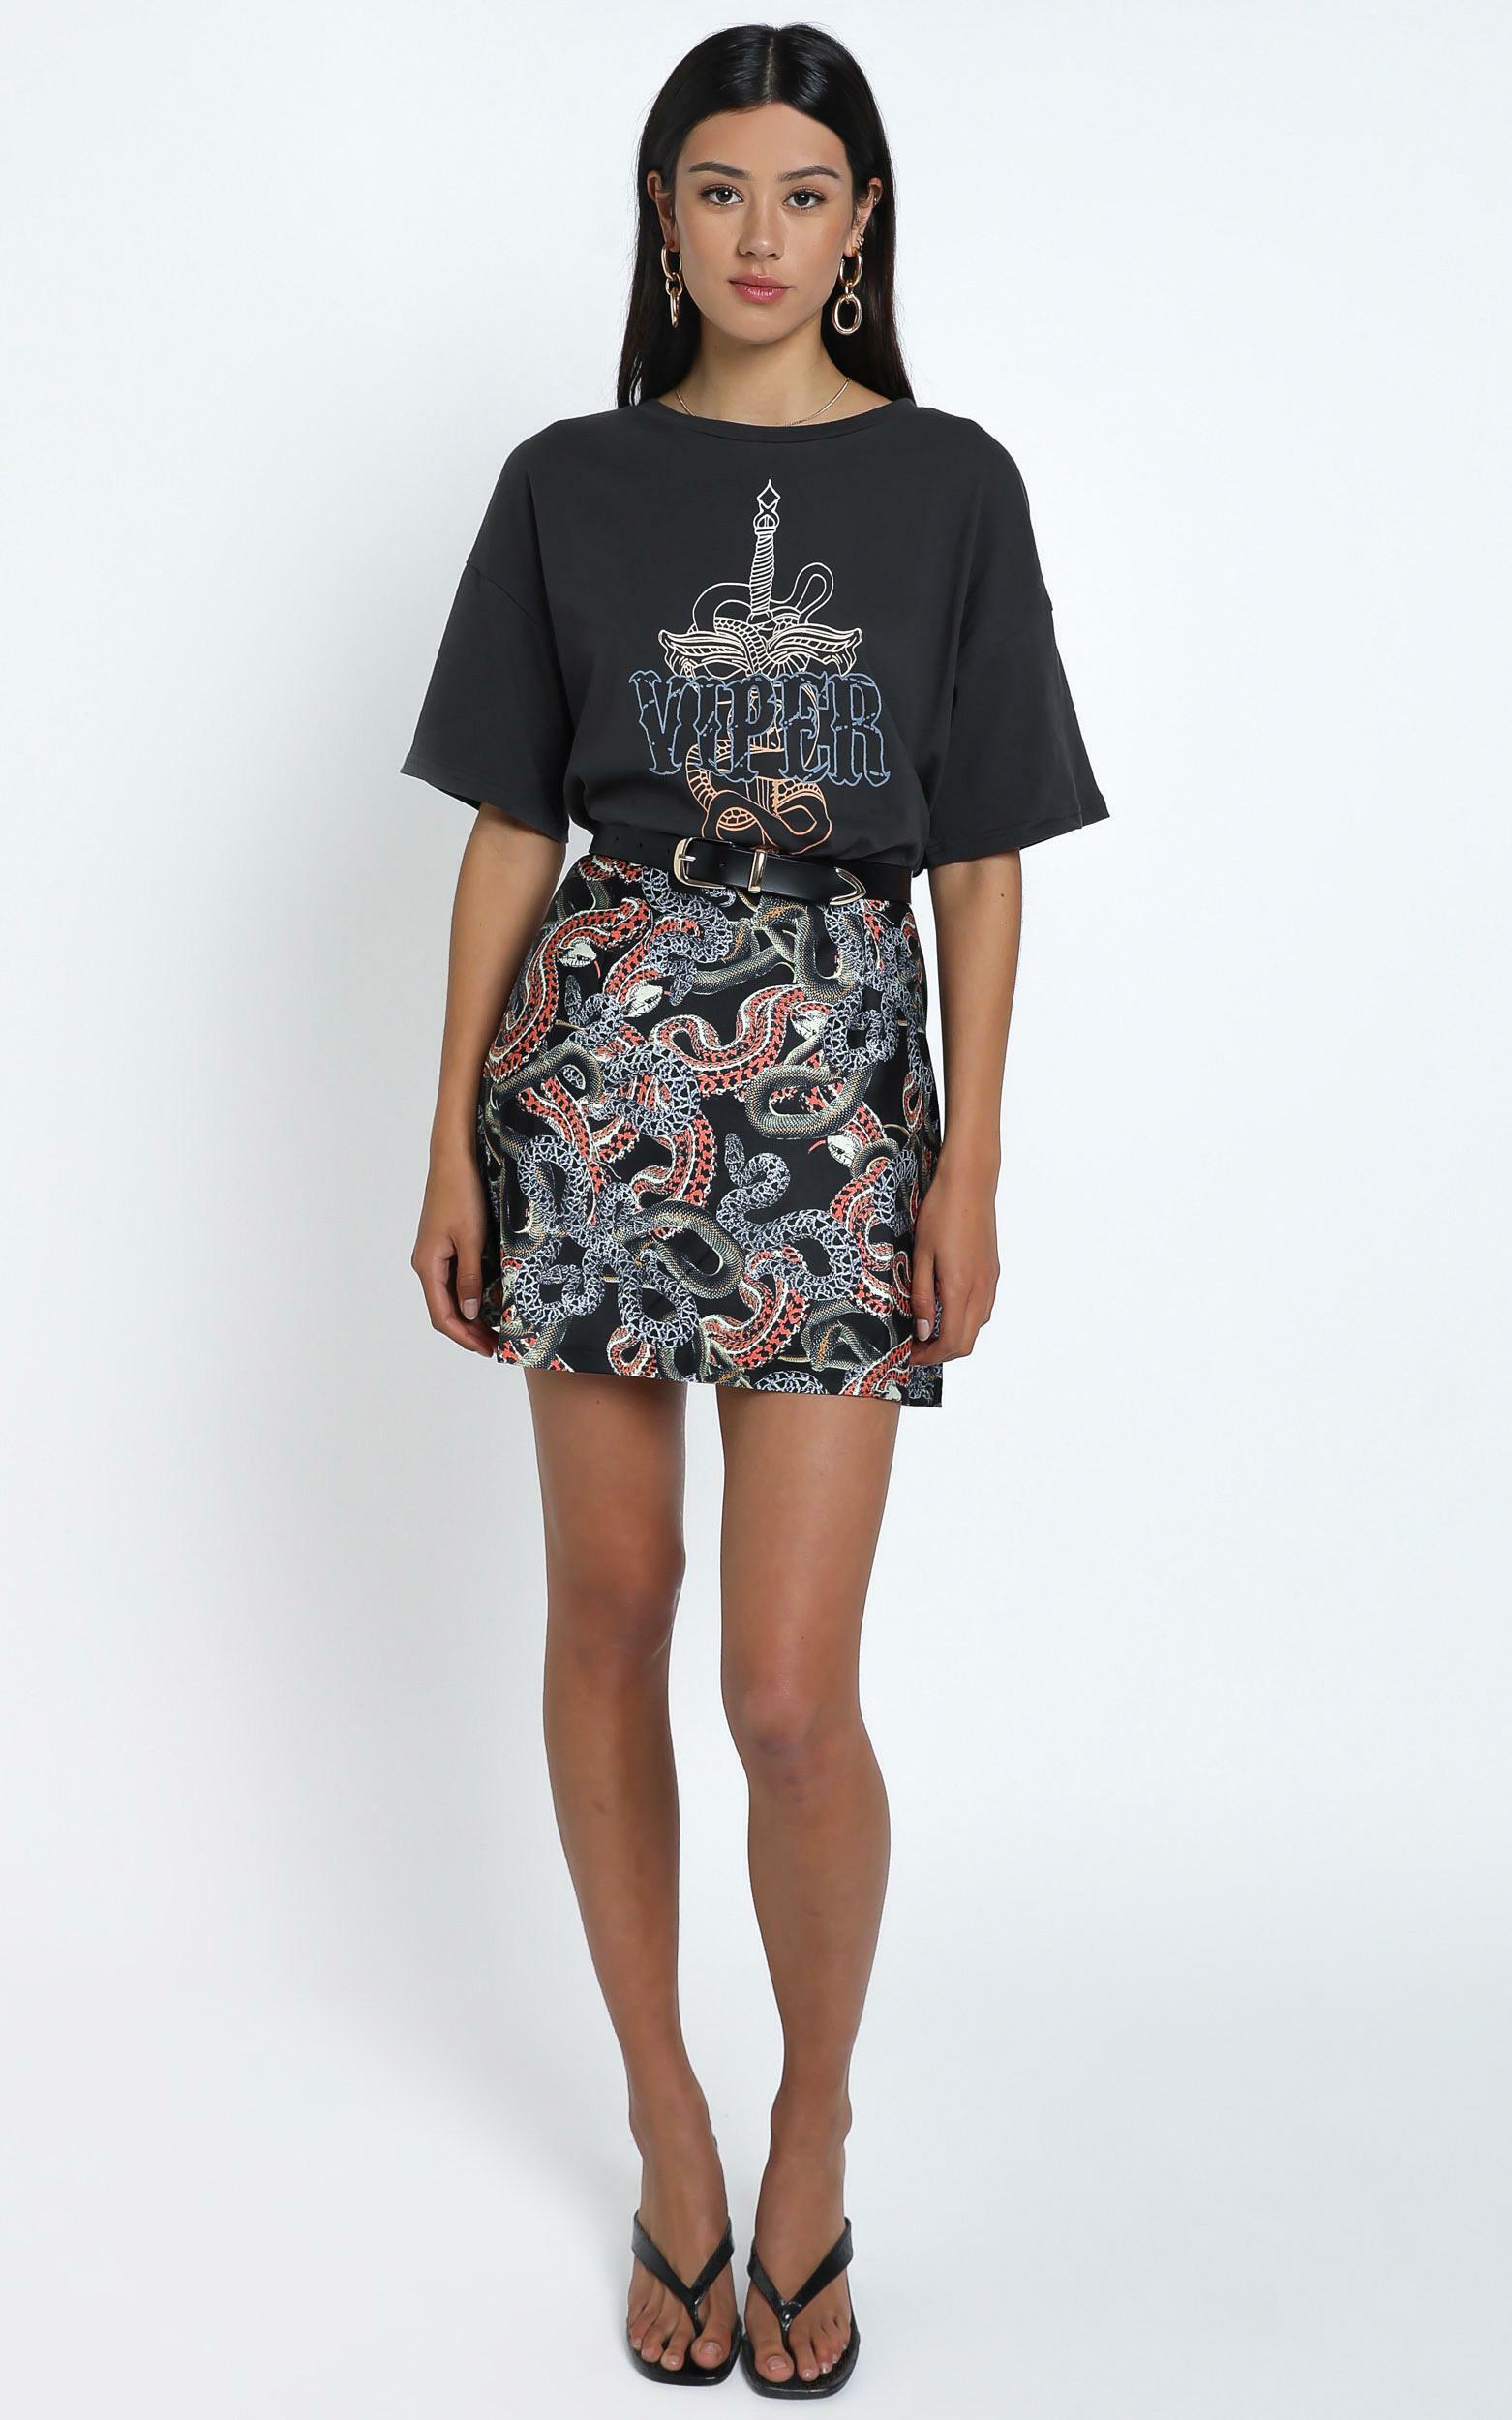 Twiin - Snakes Alive Mini Slip Skirt in Multi - 12 (L), BLK1, hi-res image number null